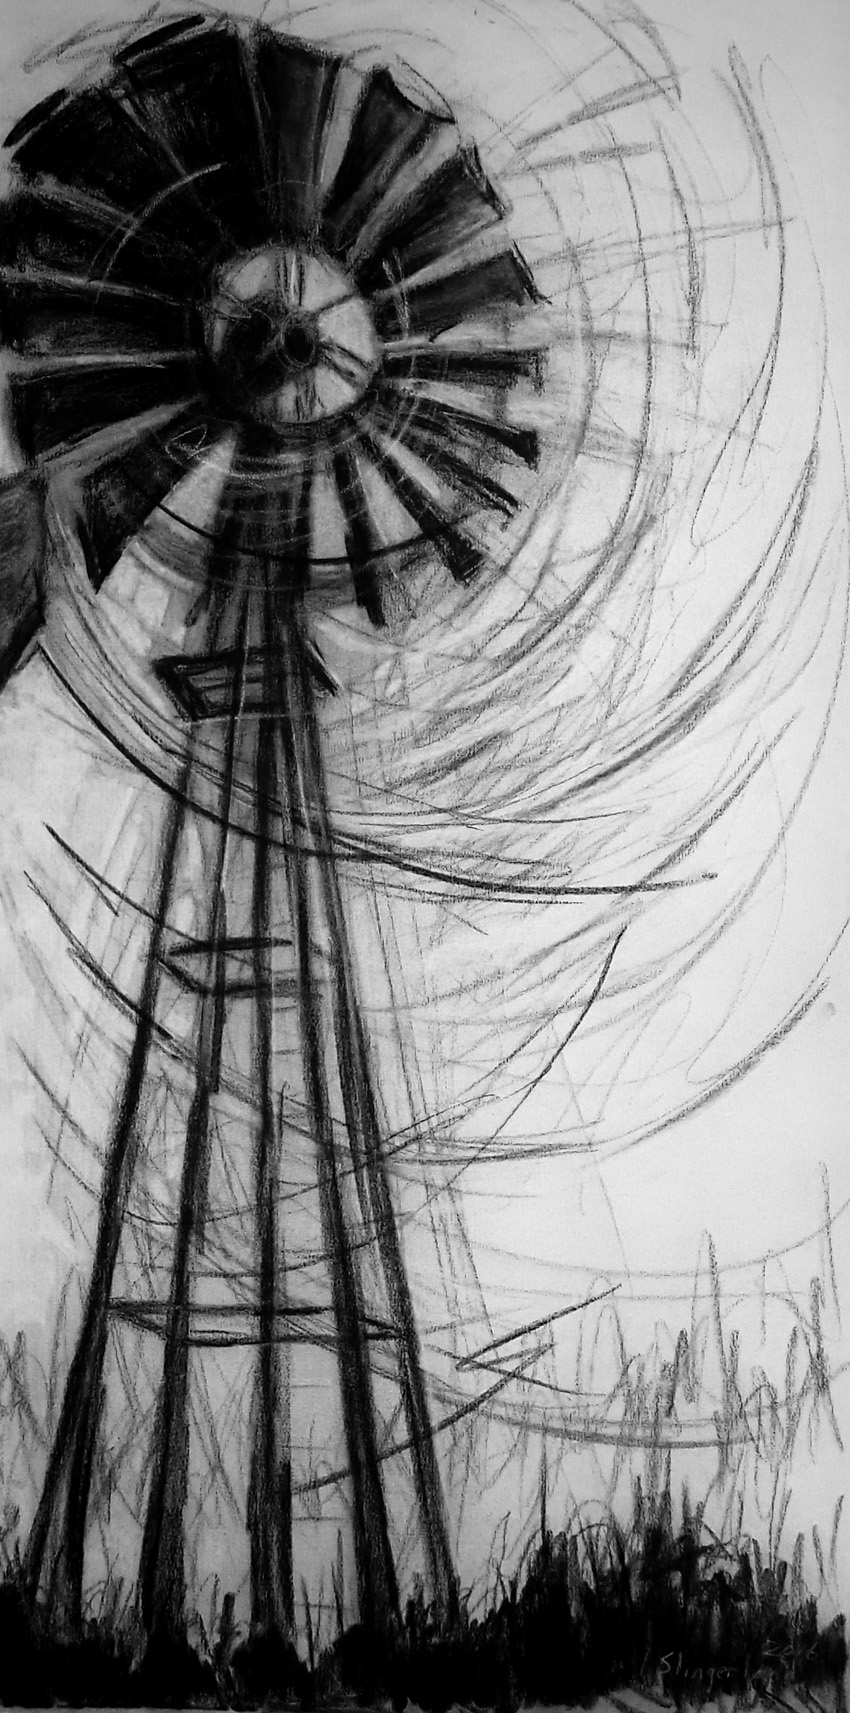 msc,windpomp,2016,charcoal on canvas,1200x600mm,R2500